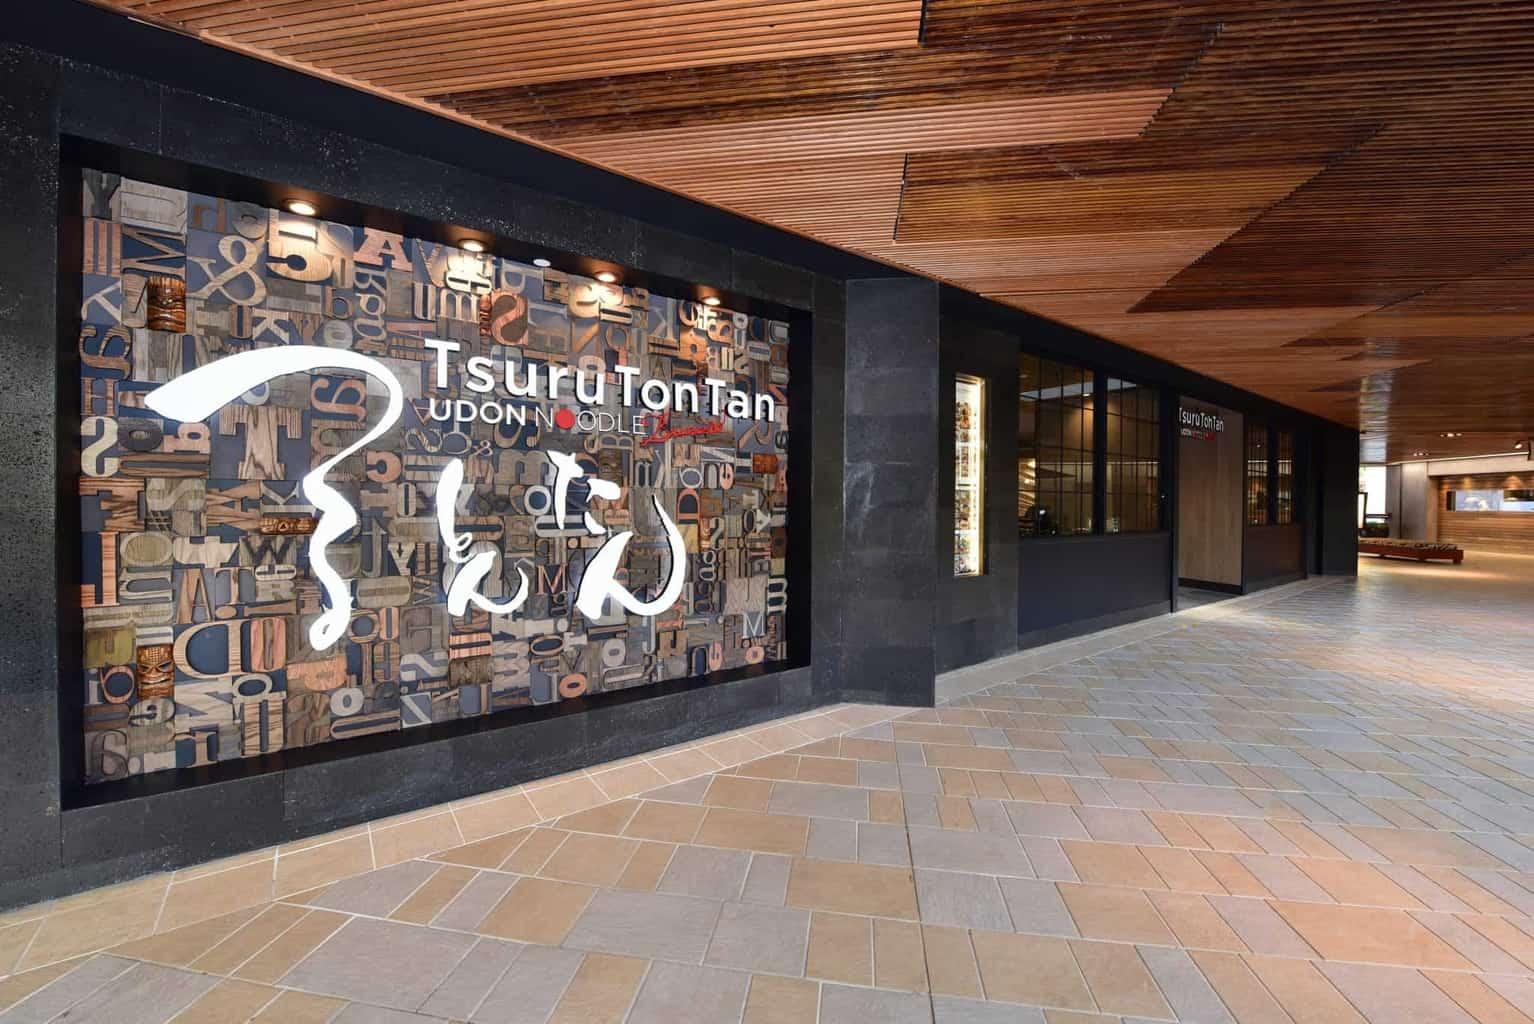 tsurutontan Located at Royal Hawaiian Center 3F